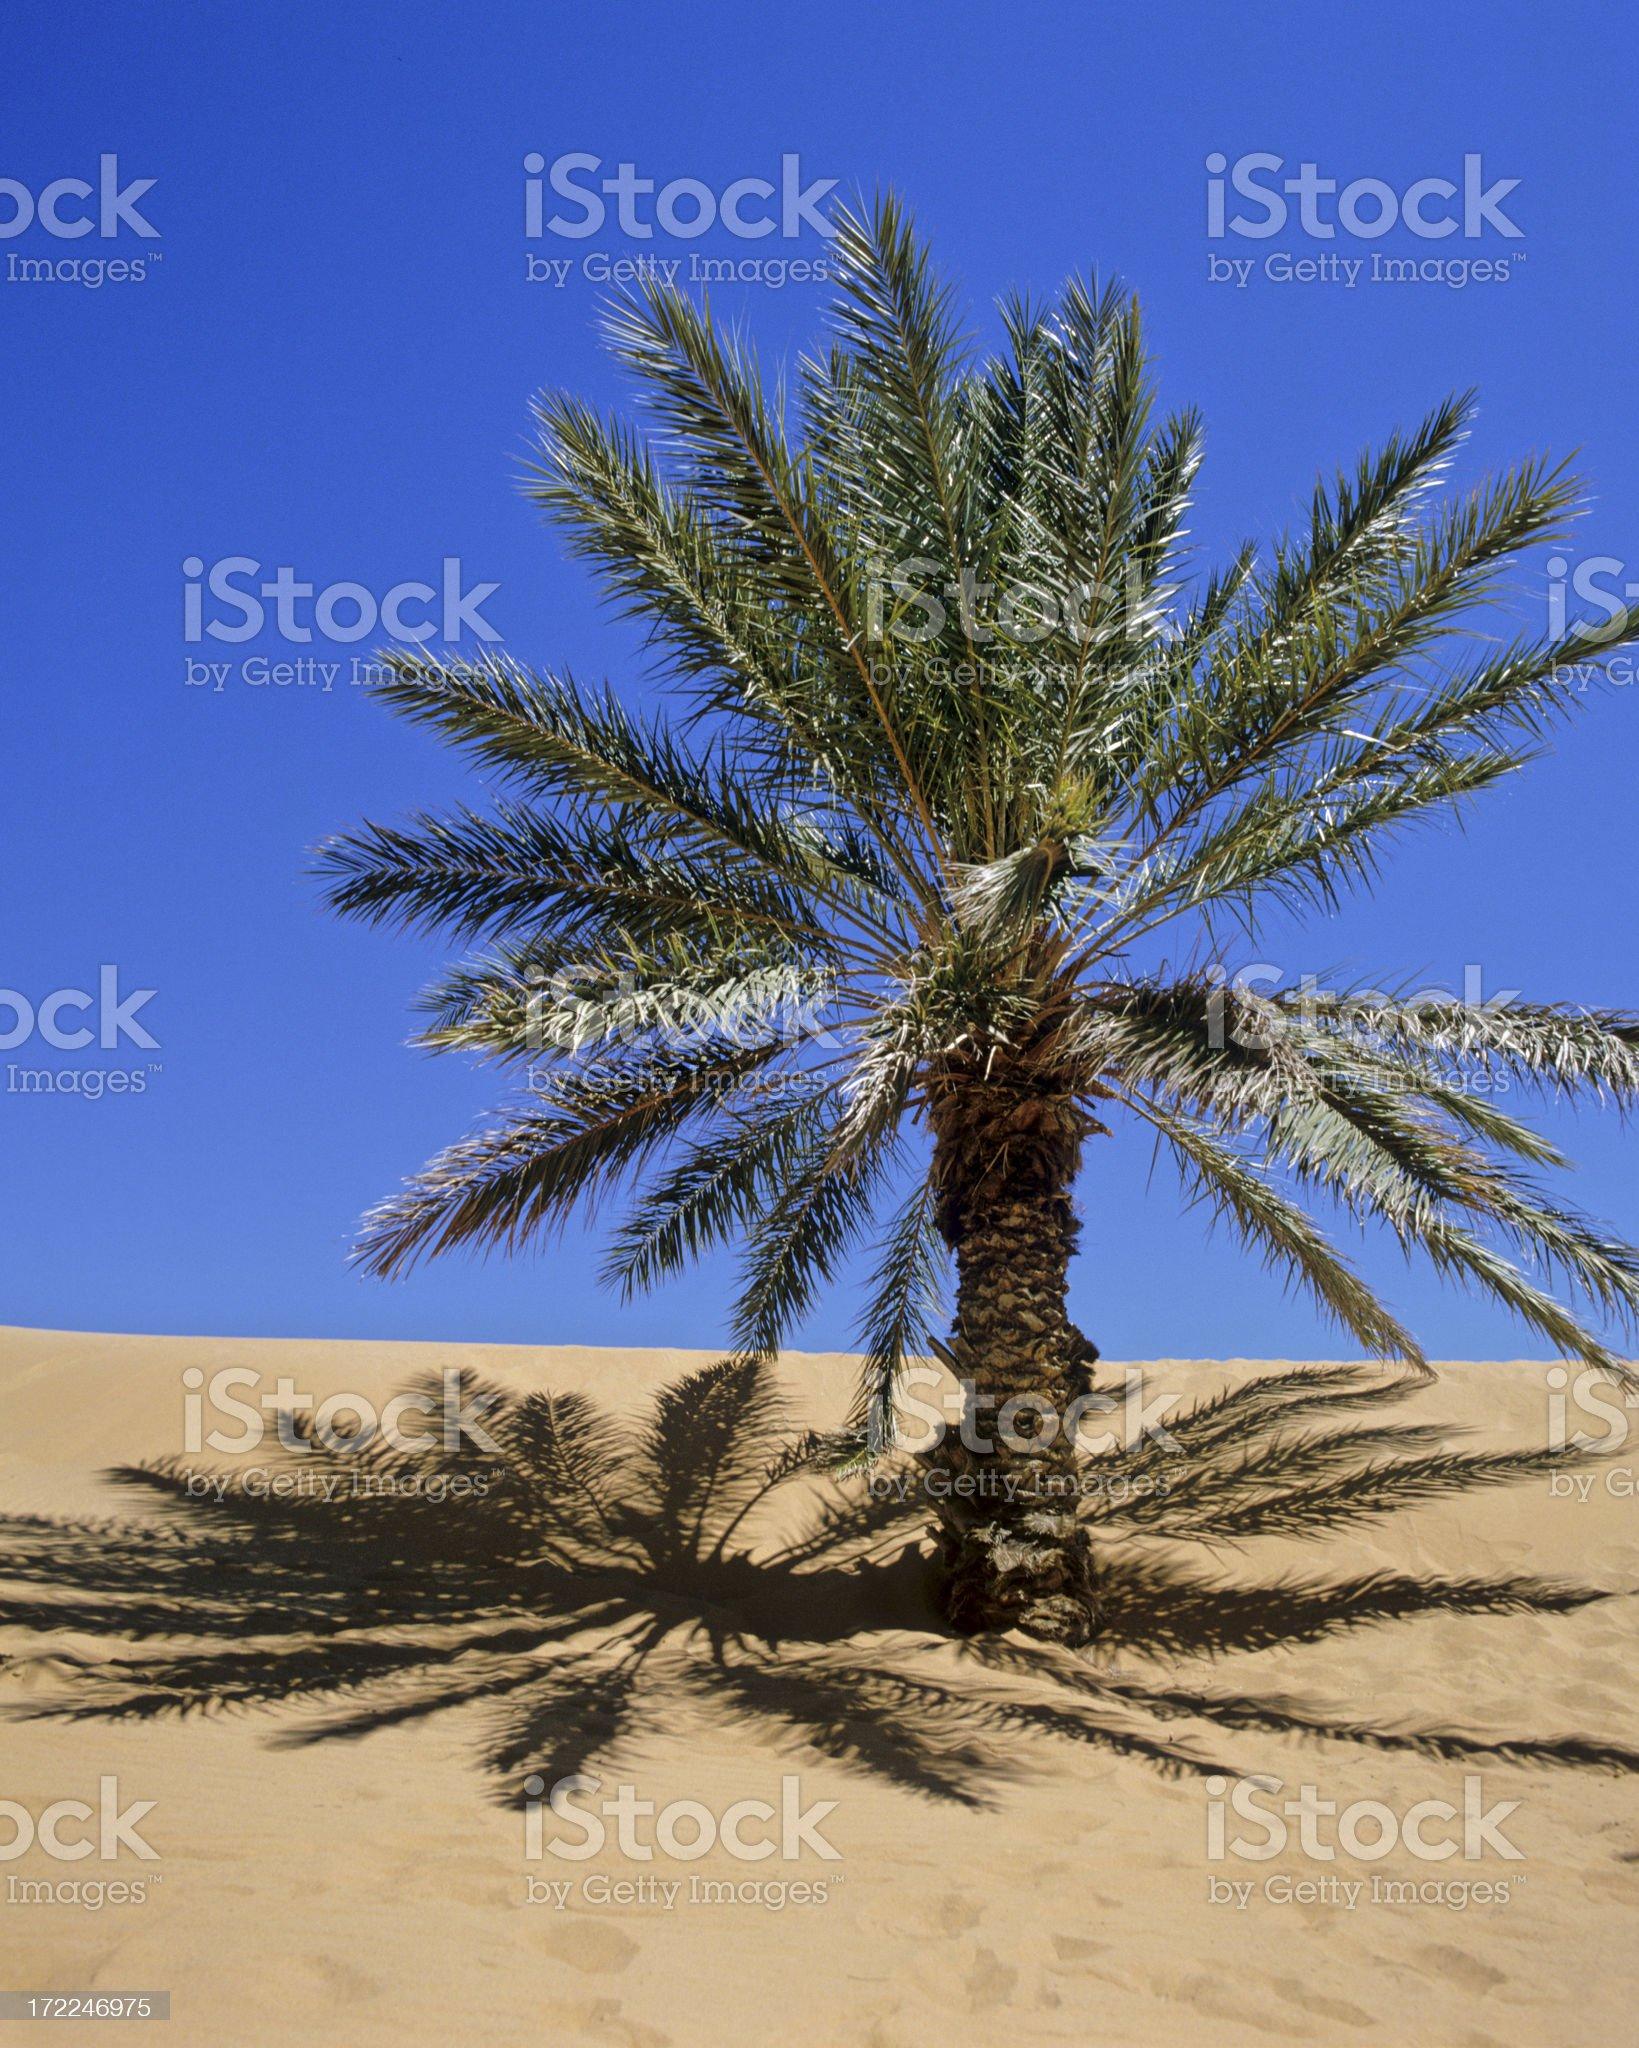 Morocco Palm in the Sahara Desert (image size XXL) royalty-free stock photo